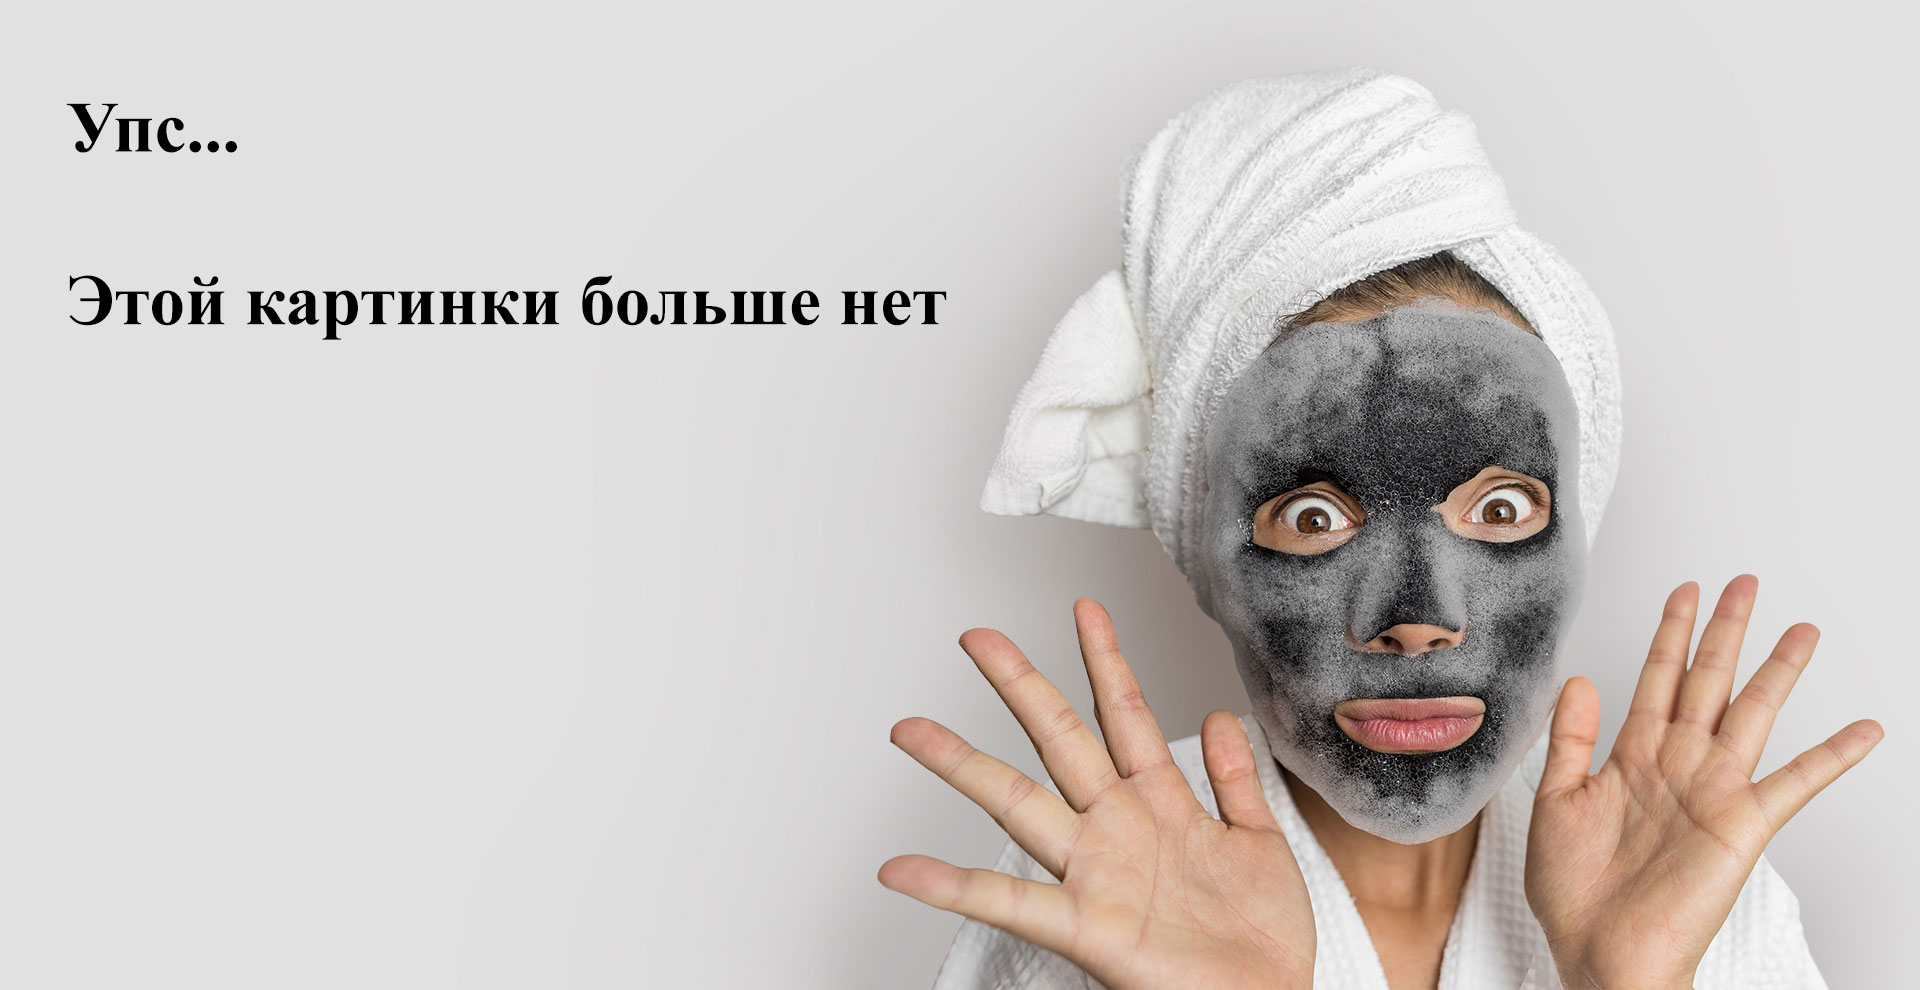 CND Vinylux, цвет Digi-Teal, 15 мл (УЦЕНКА)